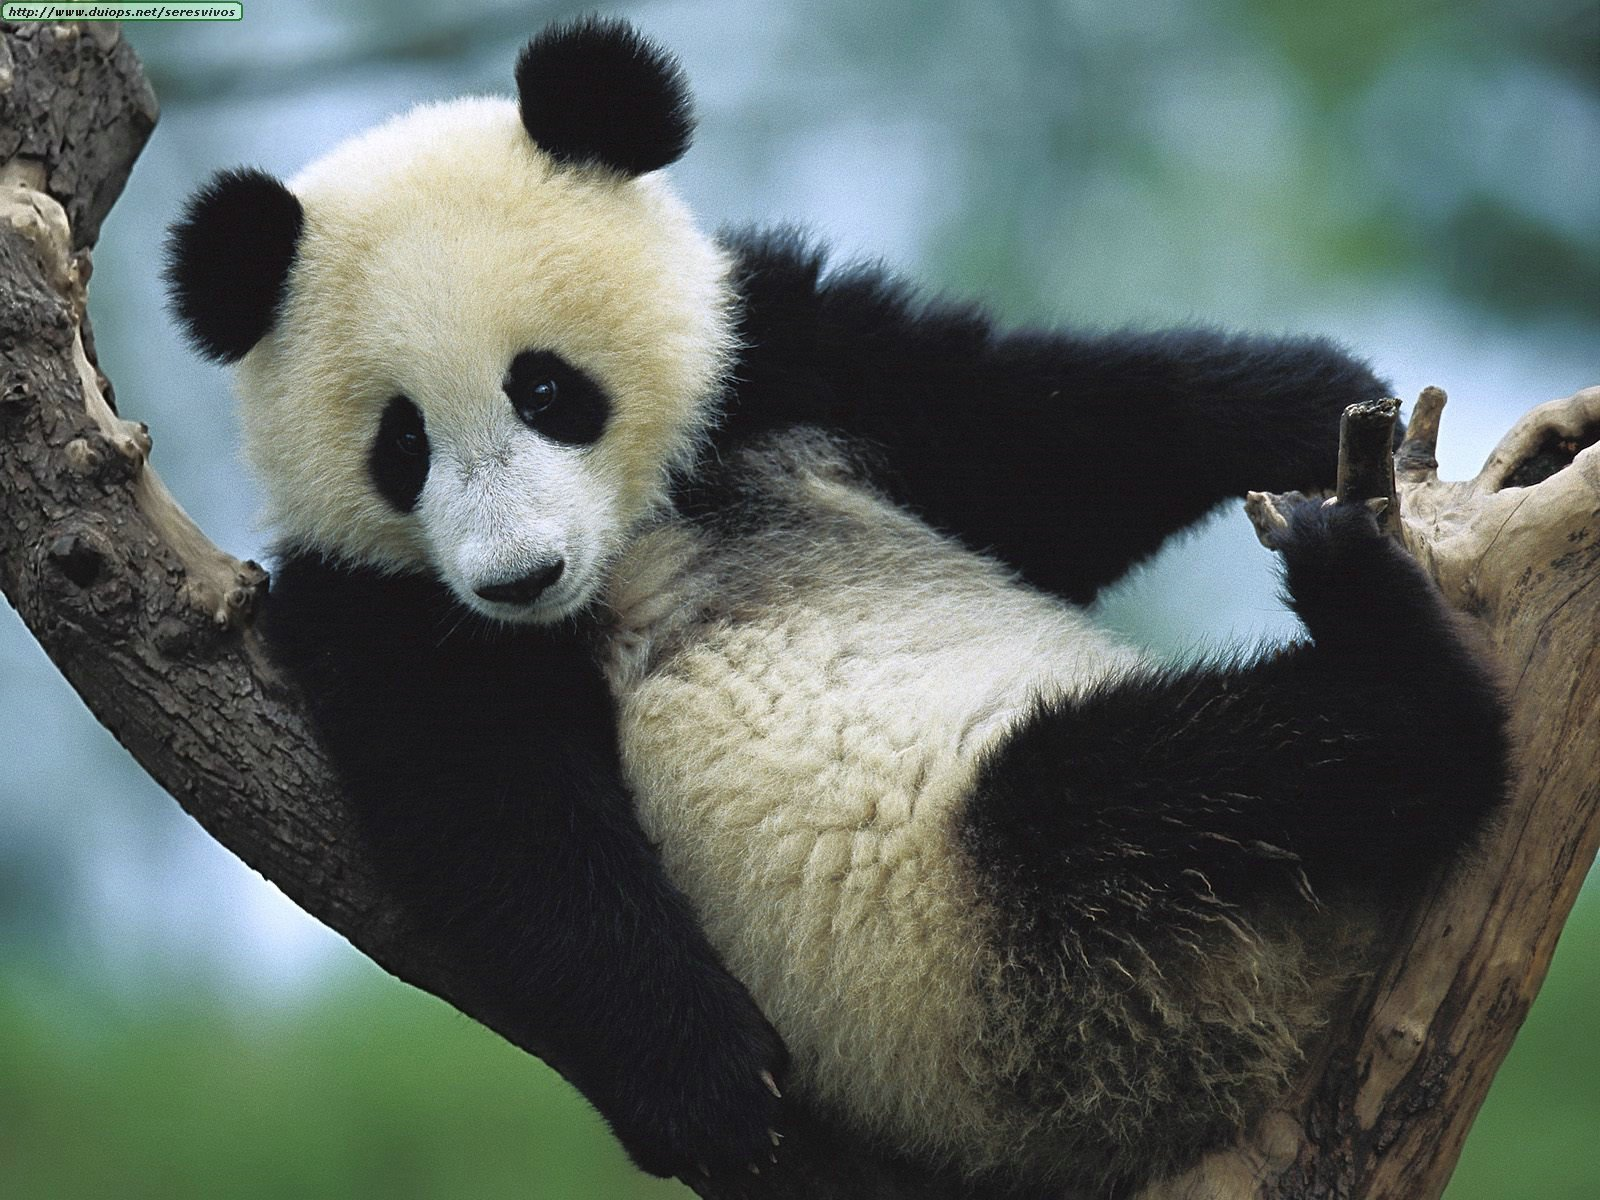 adaptation essay on pandas